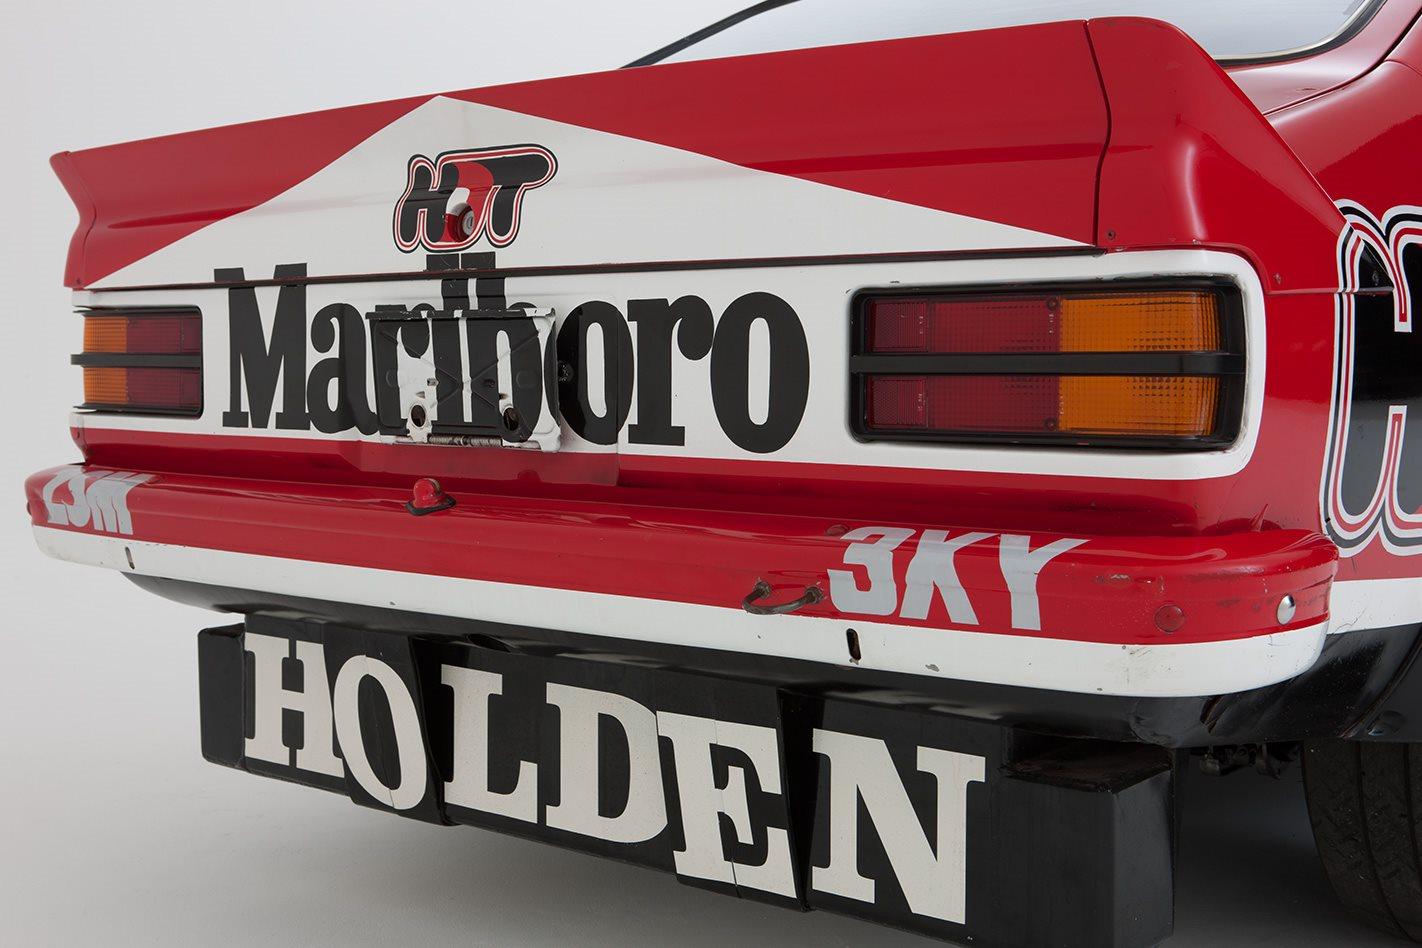 1978 HDT Torana A9X rear